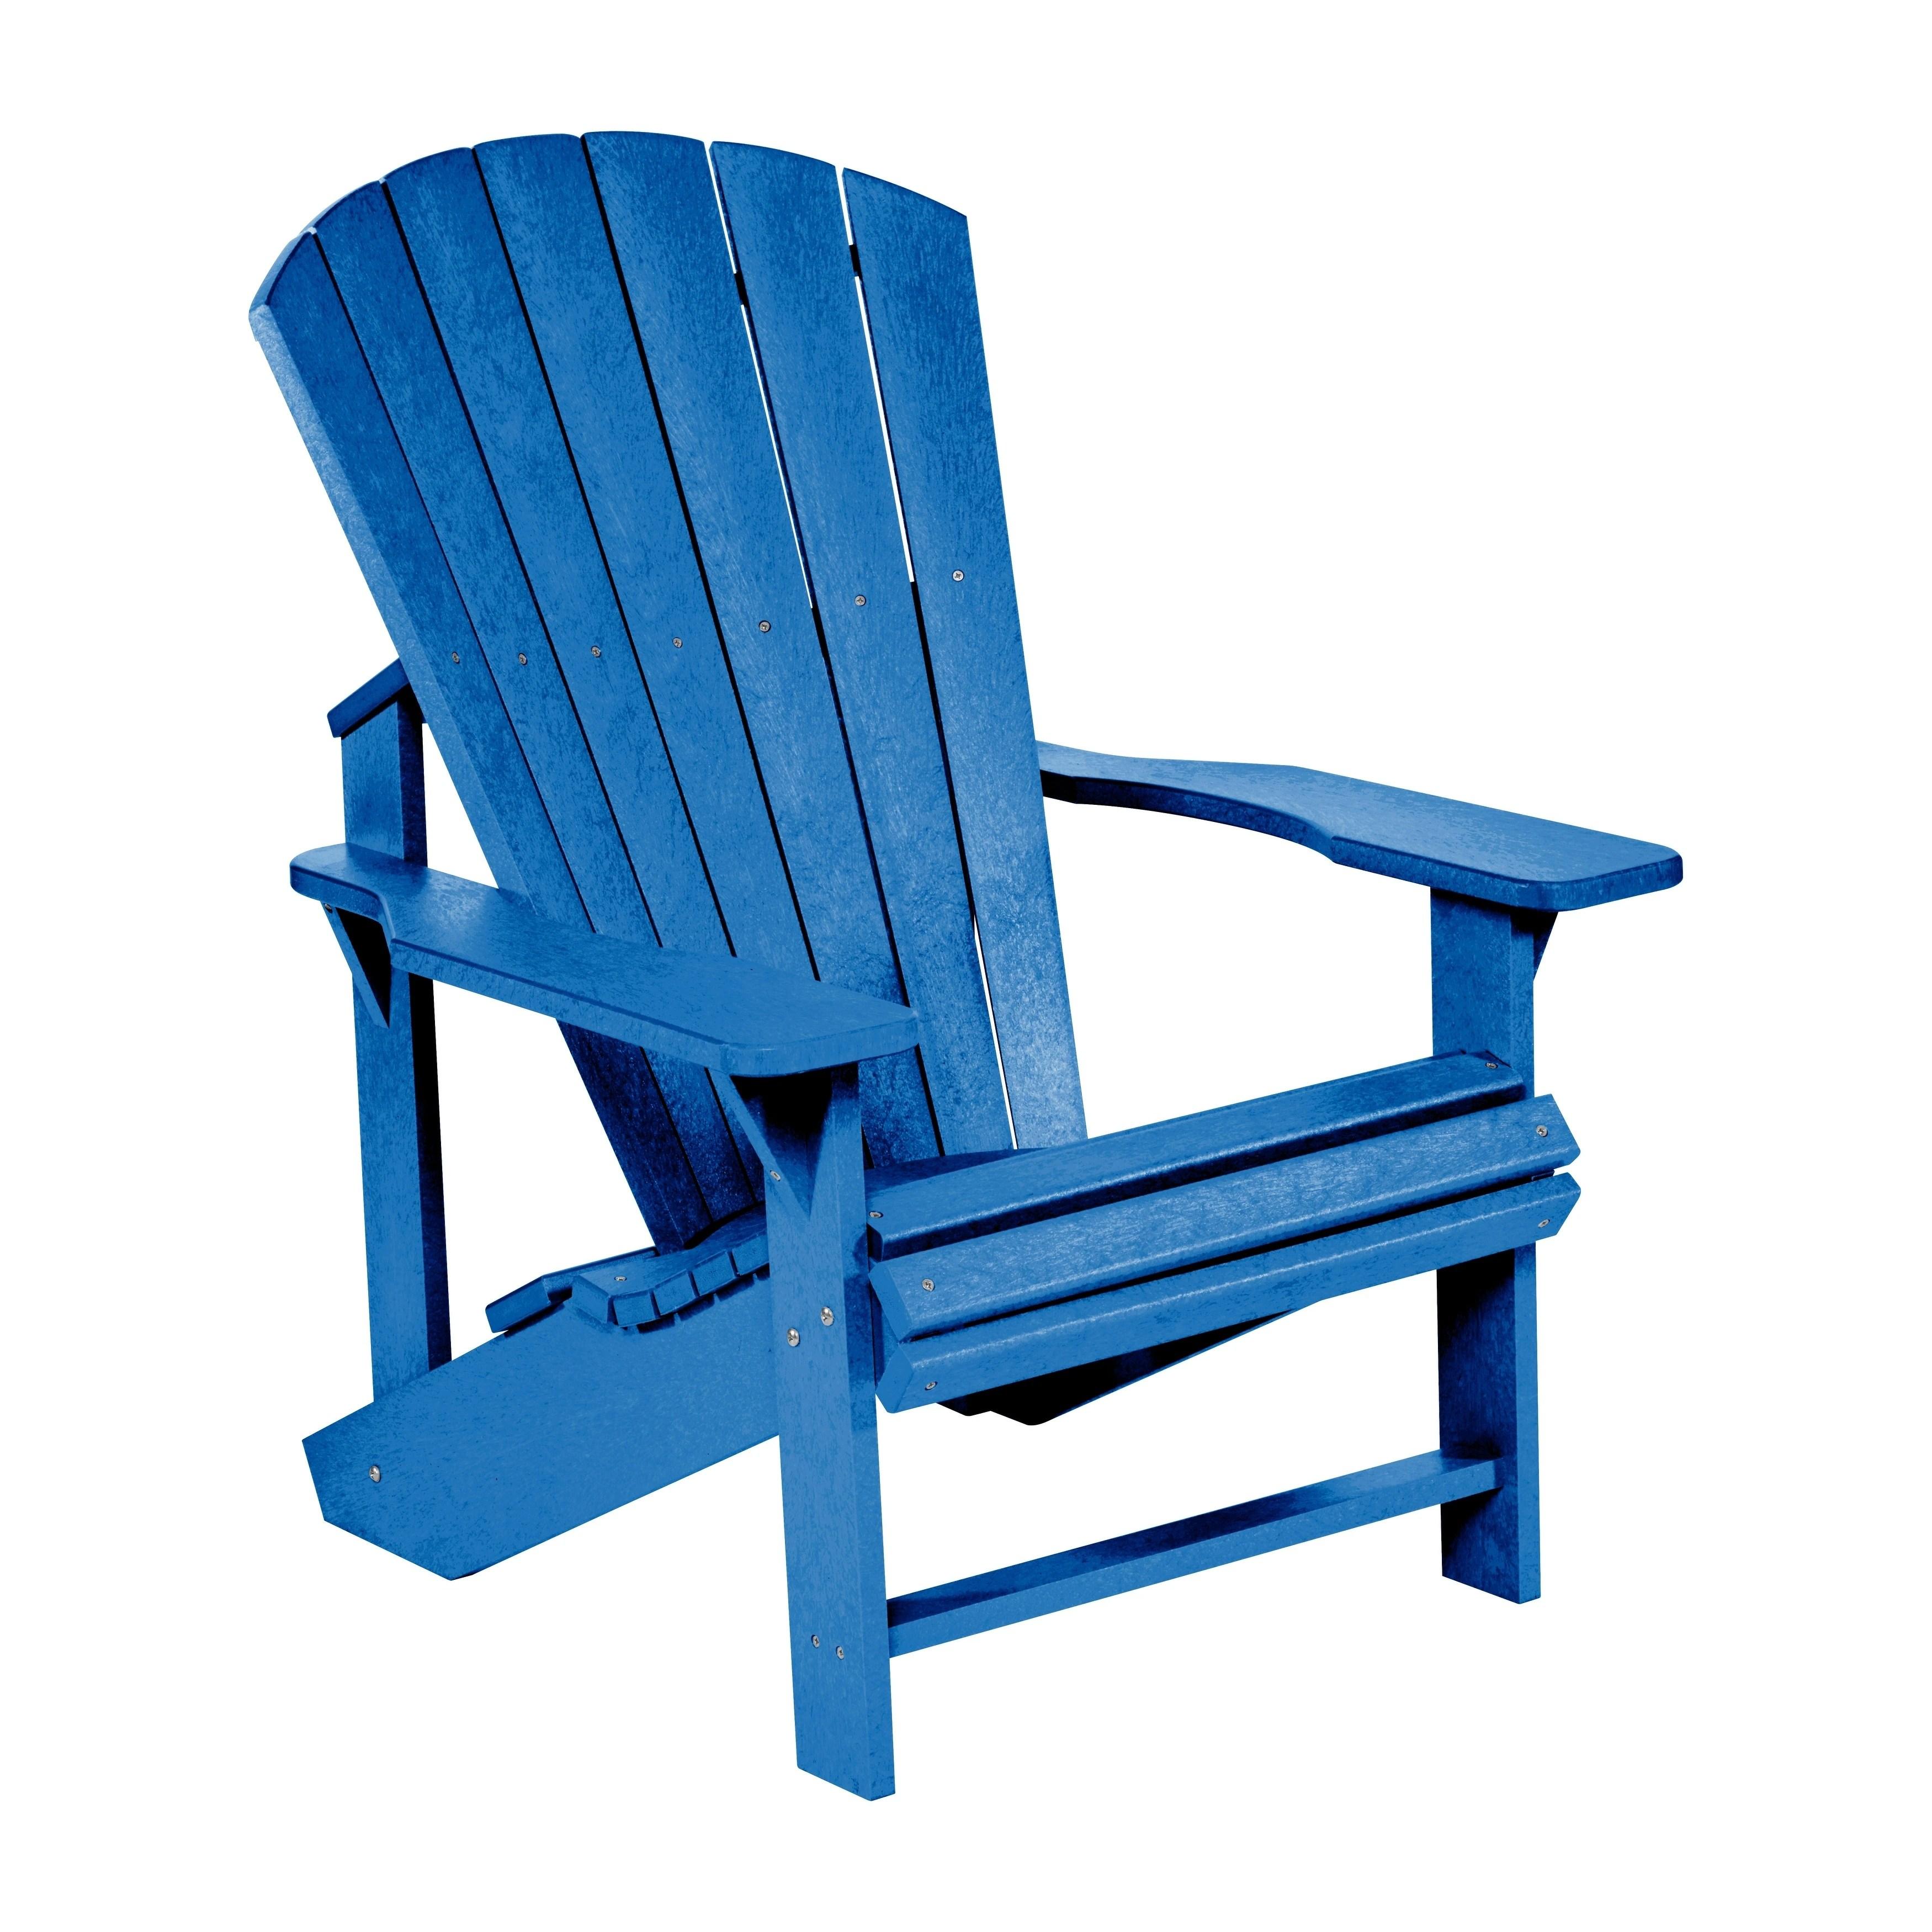 c r plastics generation adirondack chair